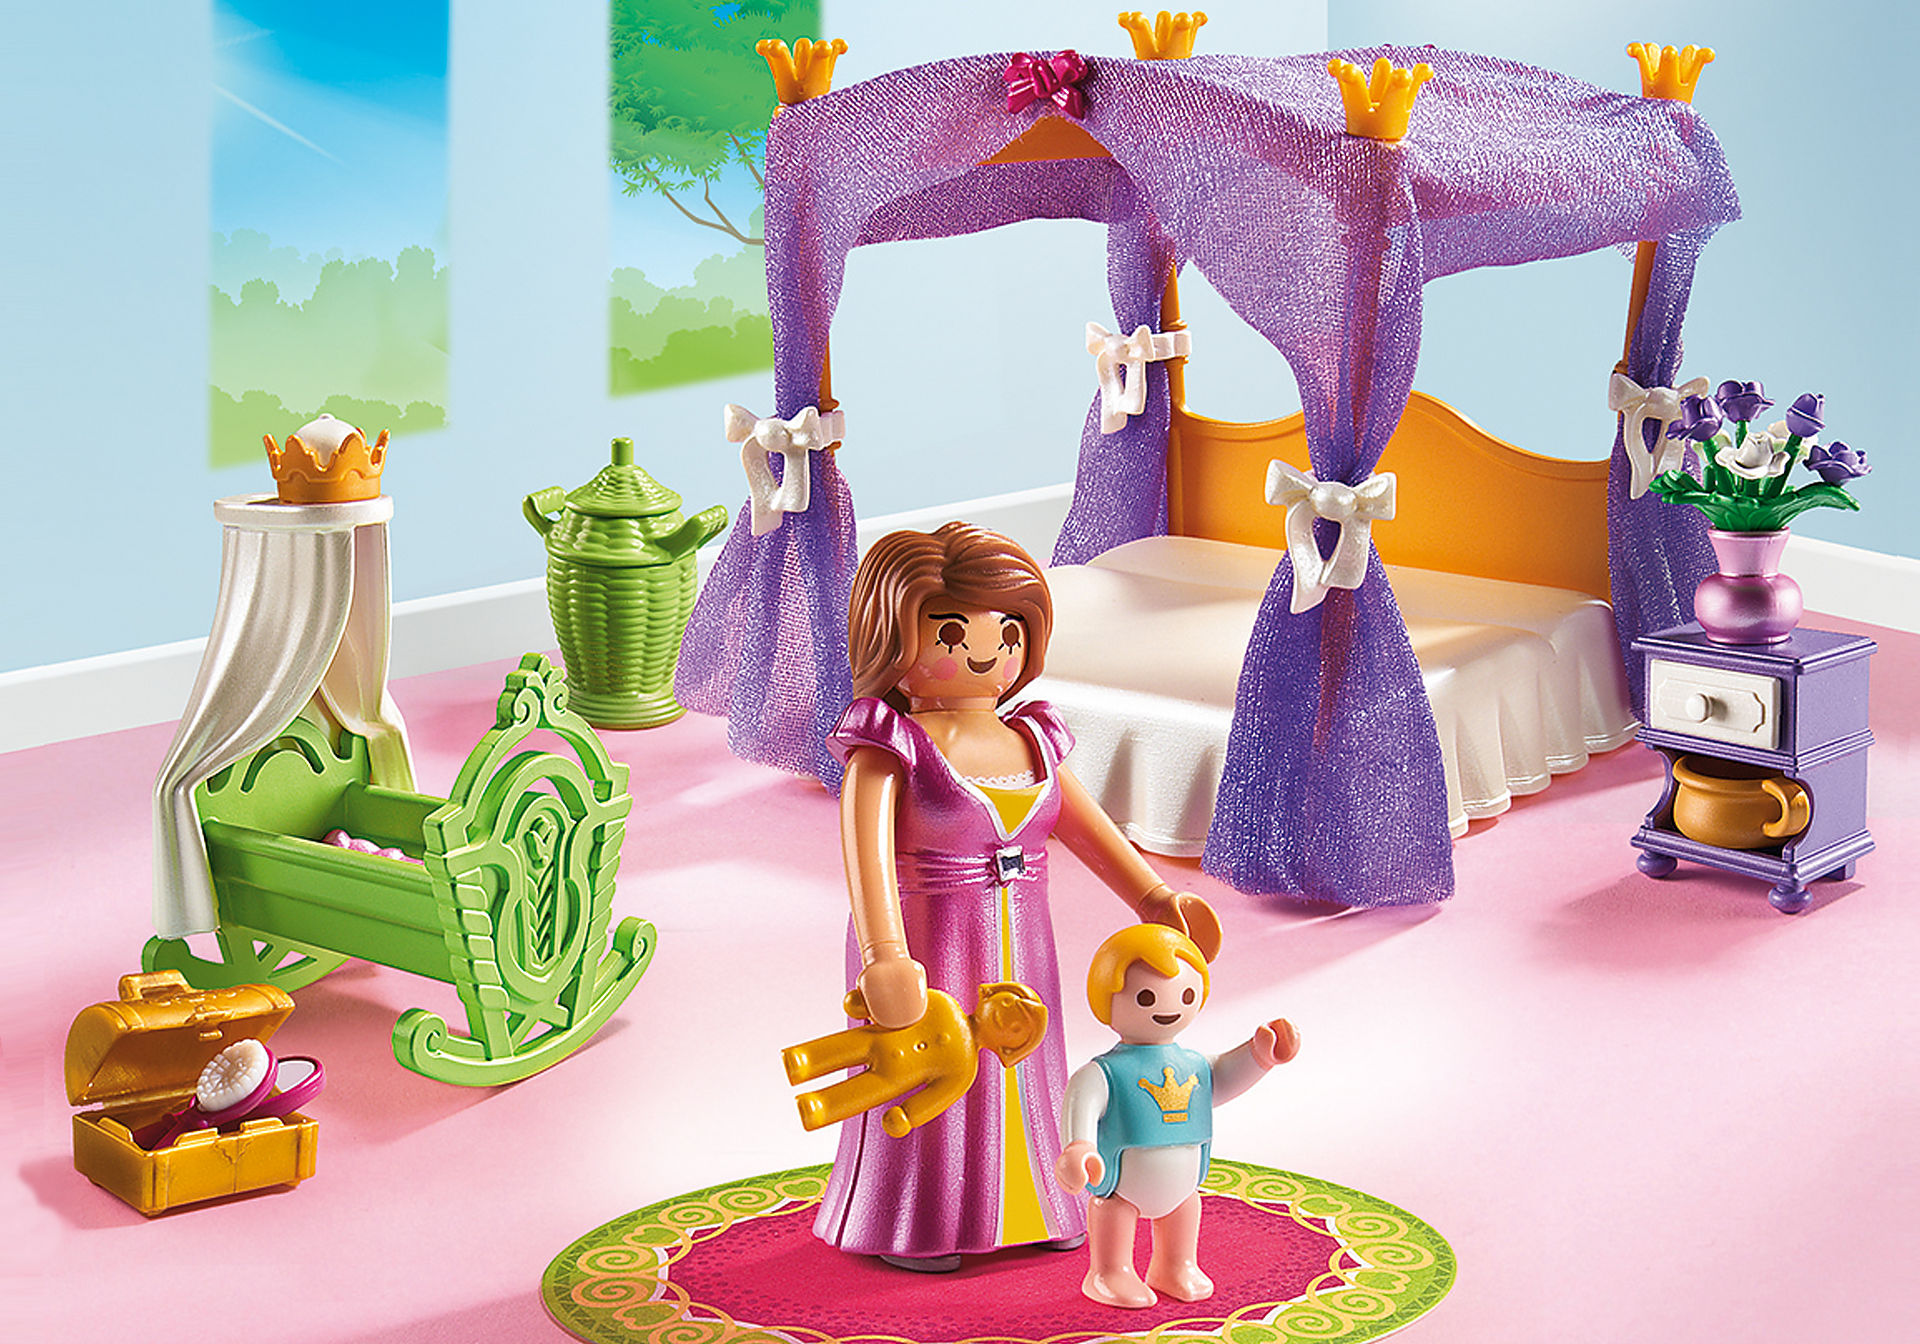 6851 Princess Chamber with Cradle zoom image1